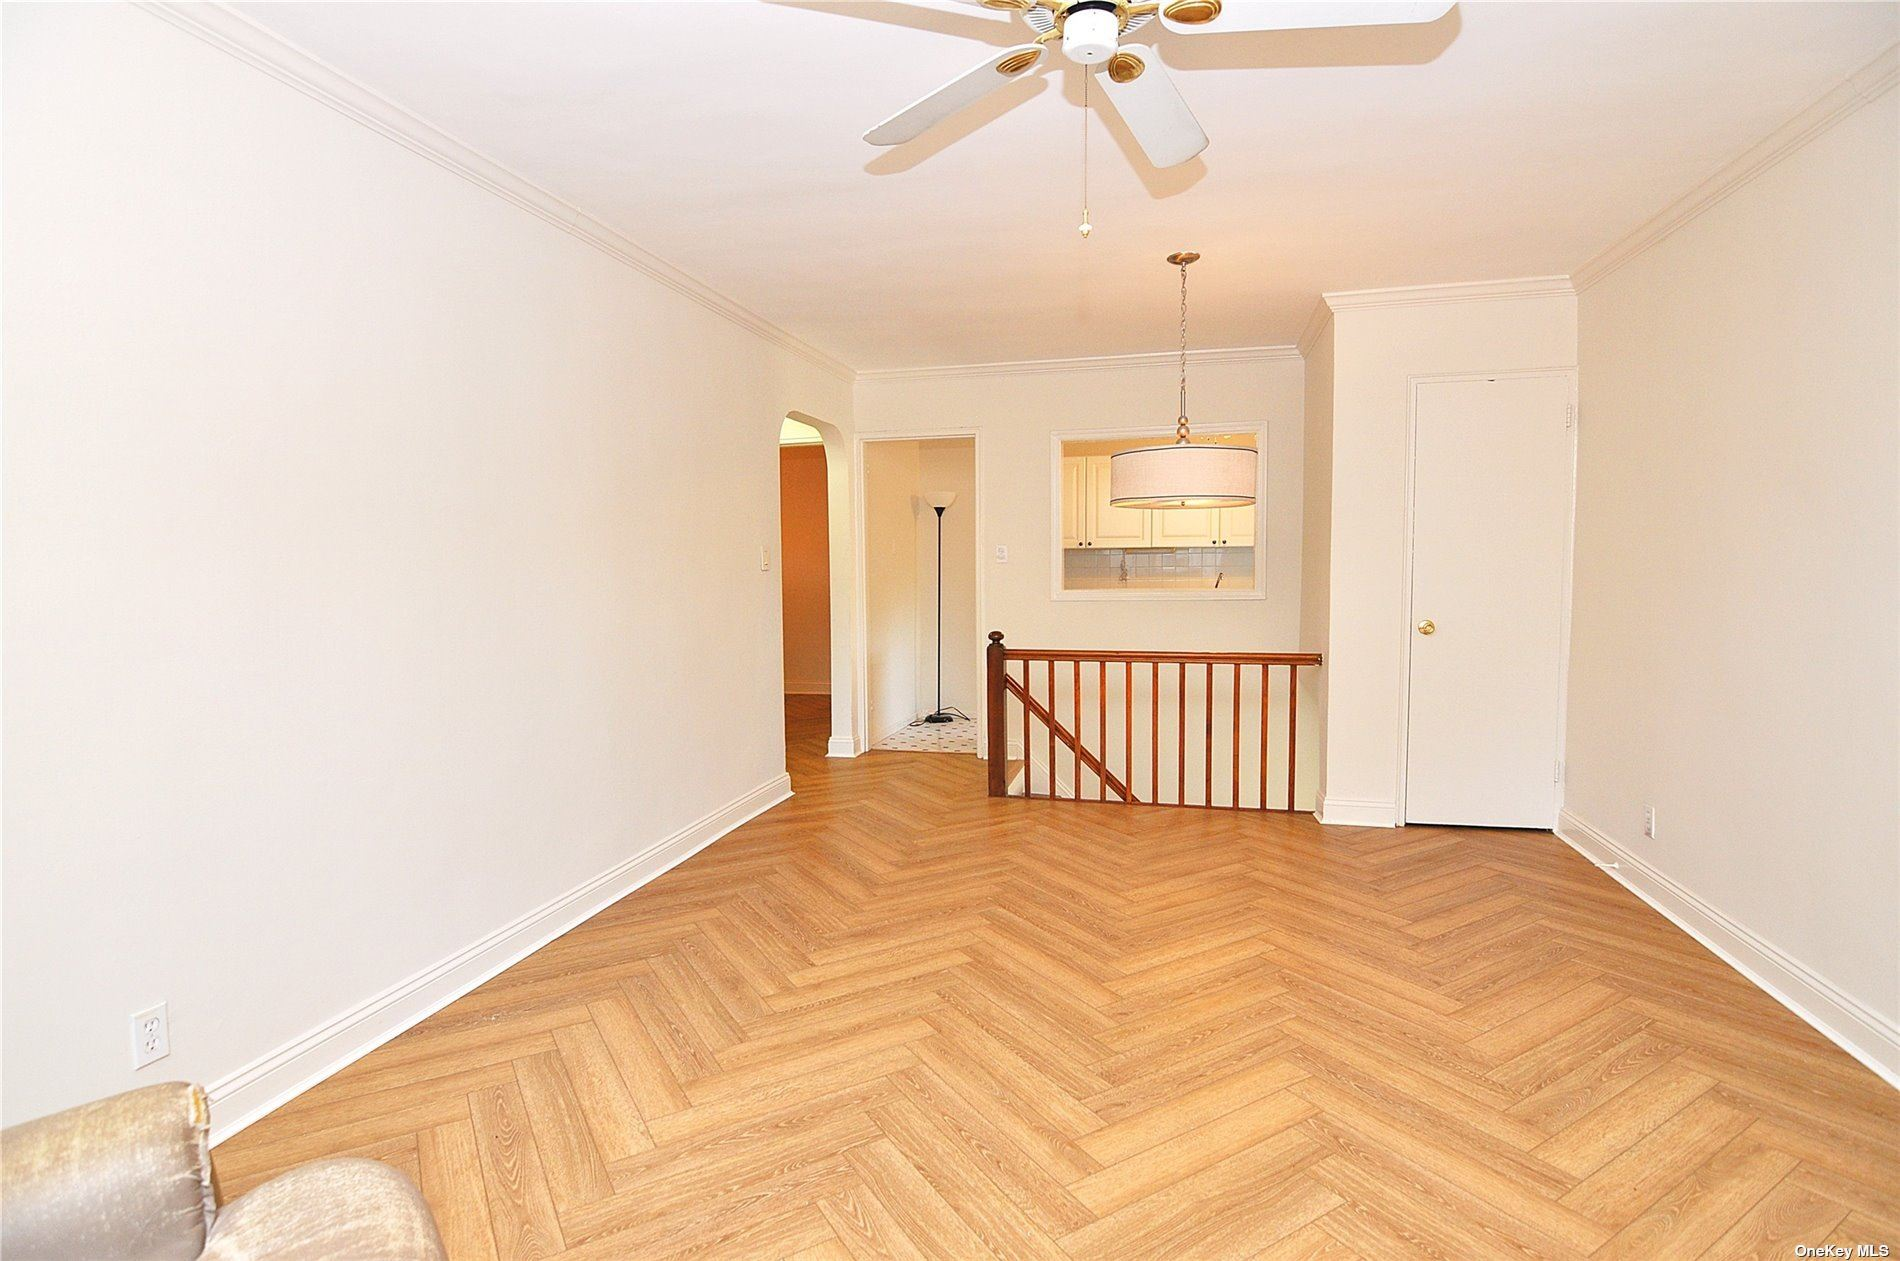 74-07 220th Street #Upper, Bayside, NY 11364 - MLS#: 3306322